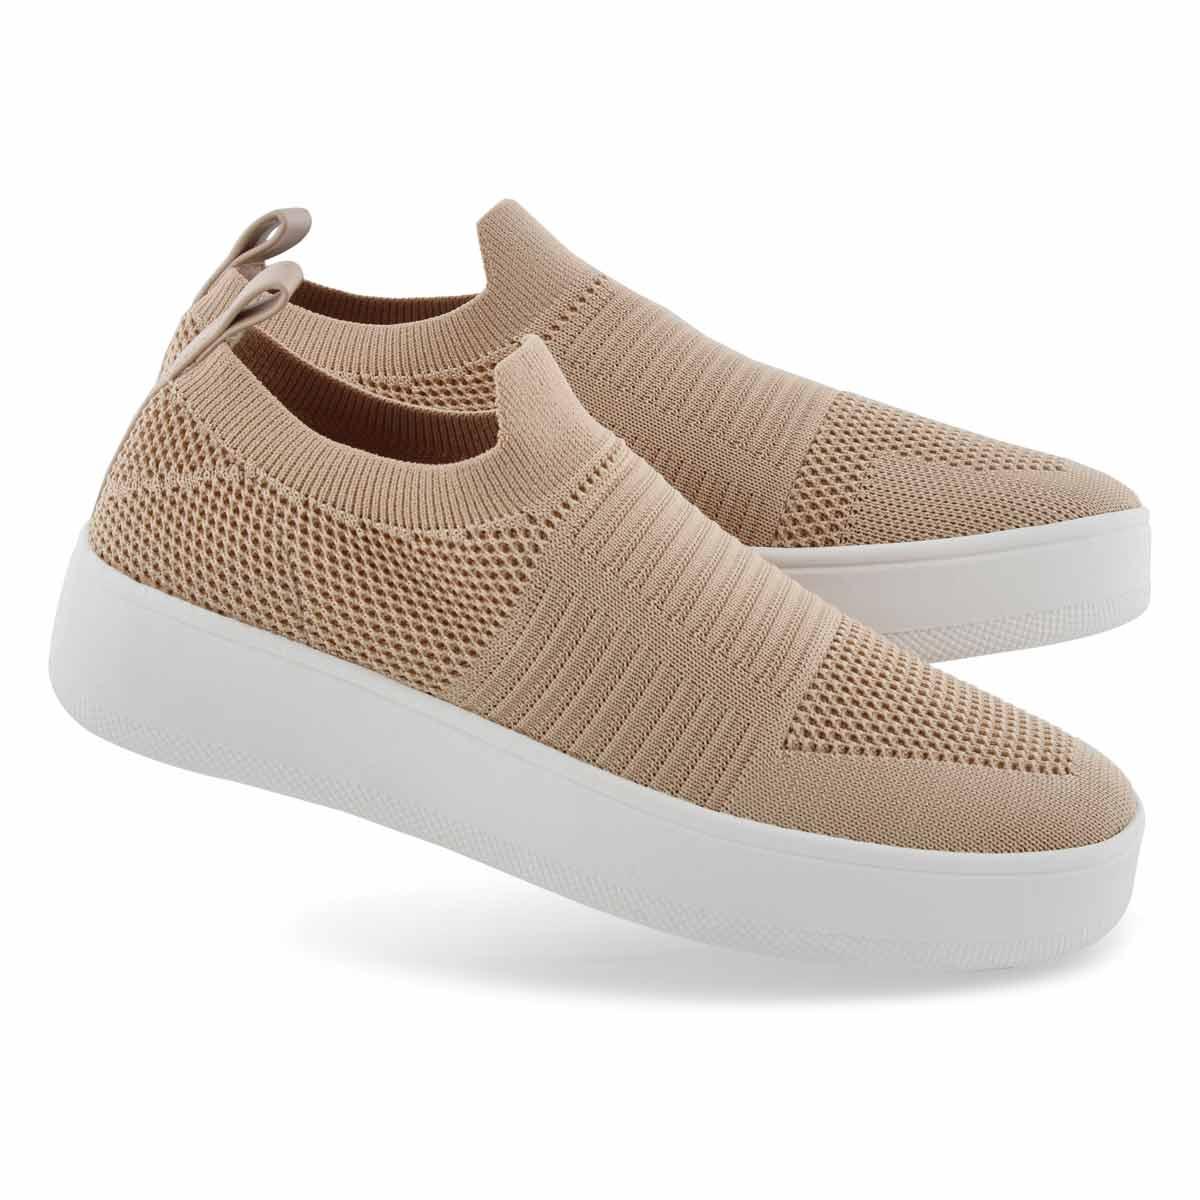 536c2bb1a75 Lds Beale blush slip on fashion sneakers. steve madden